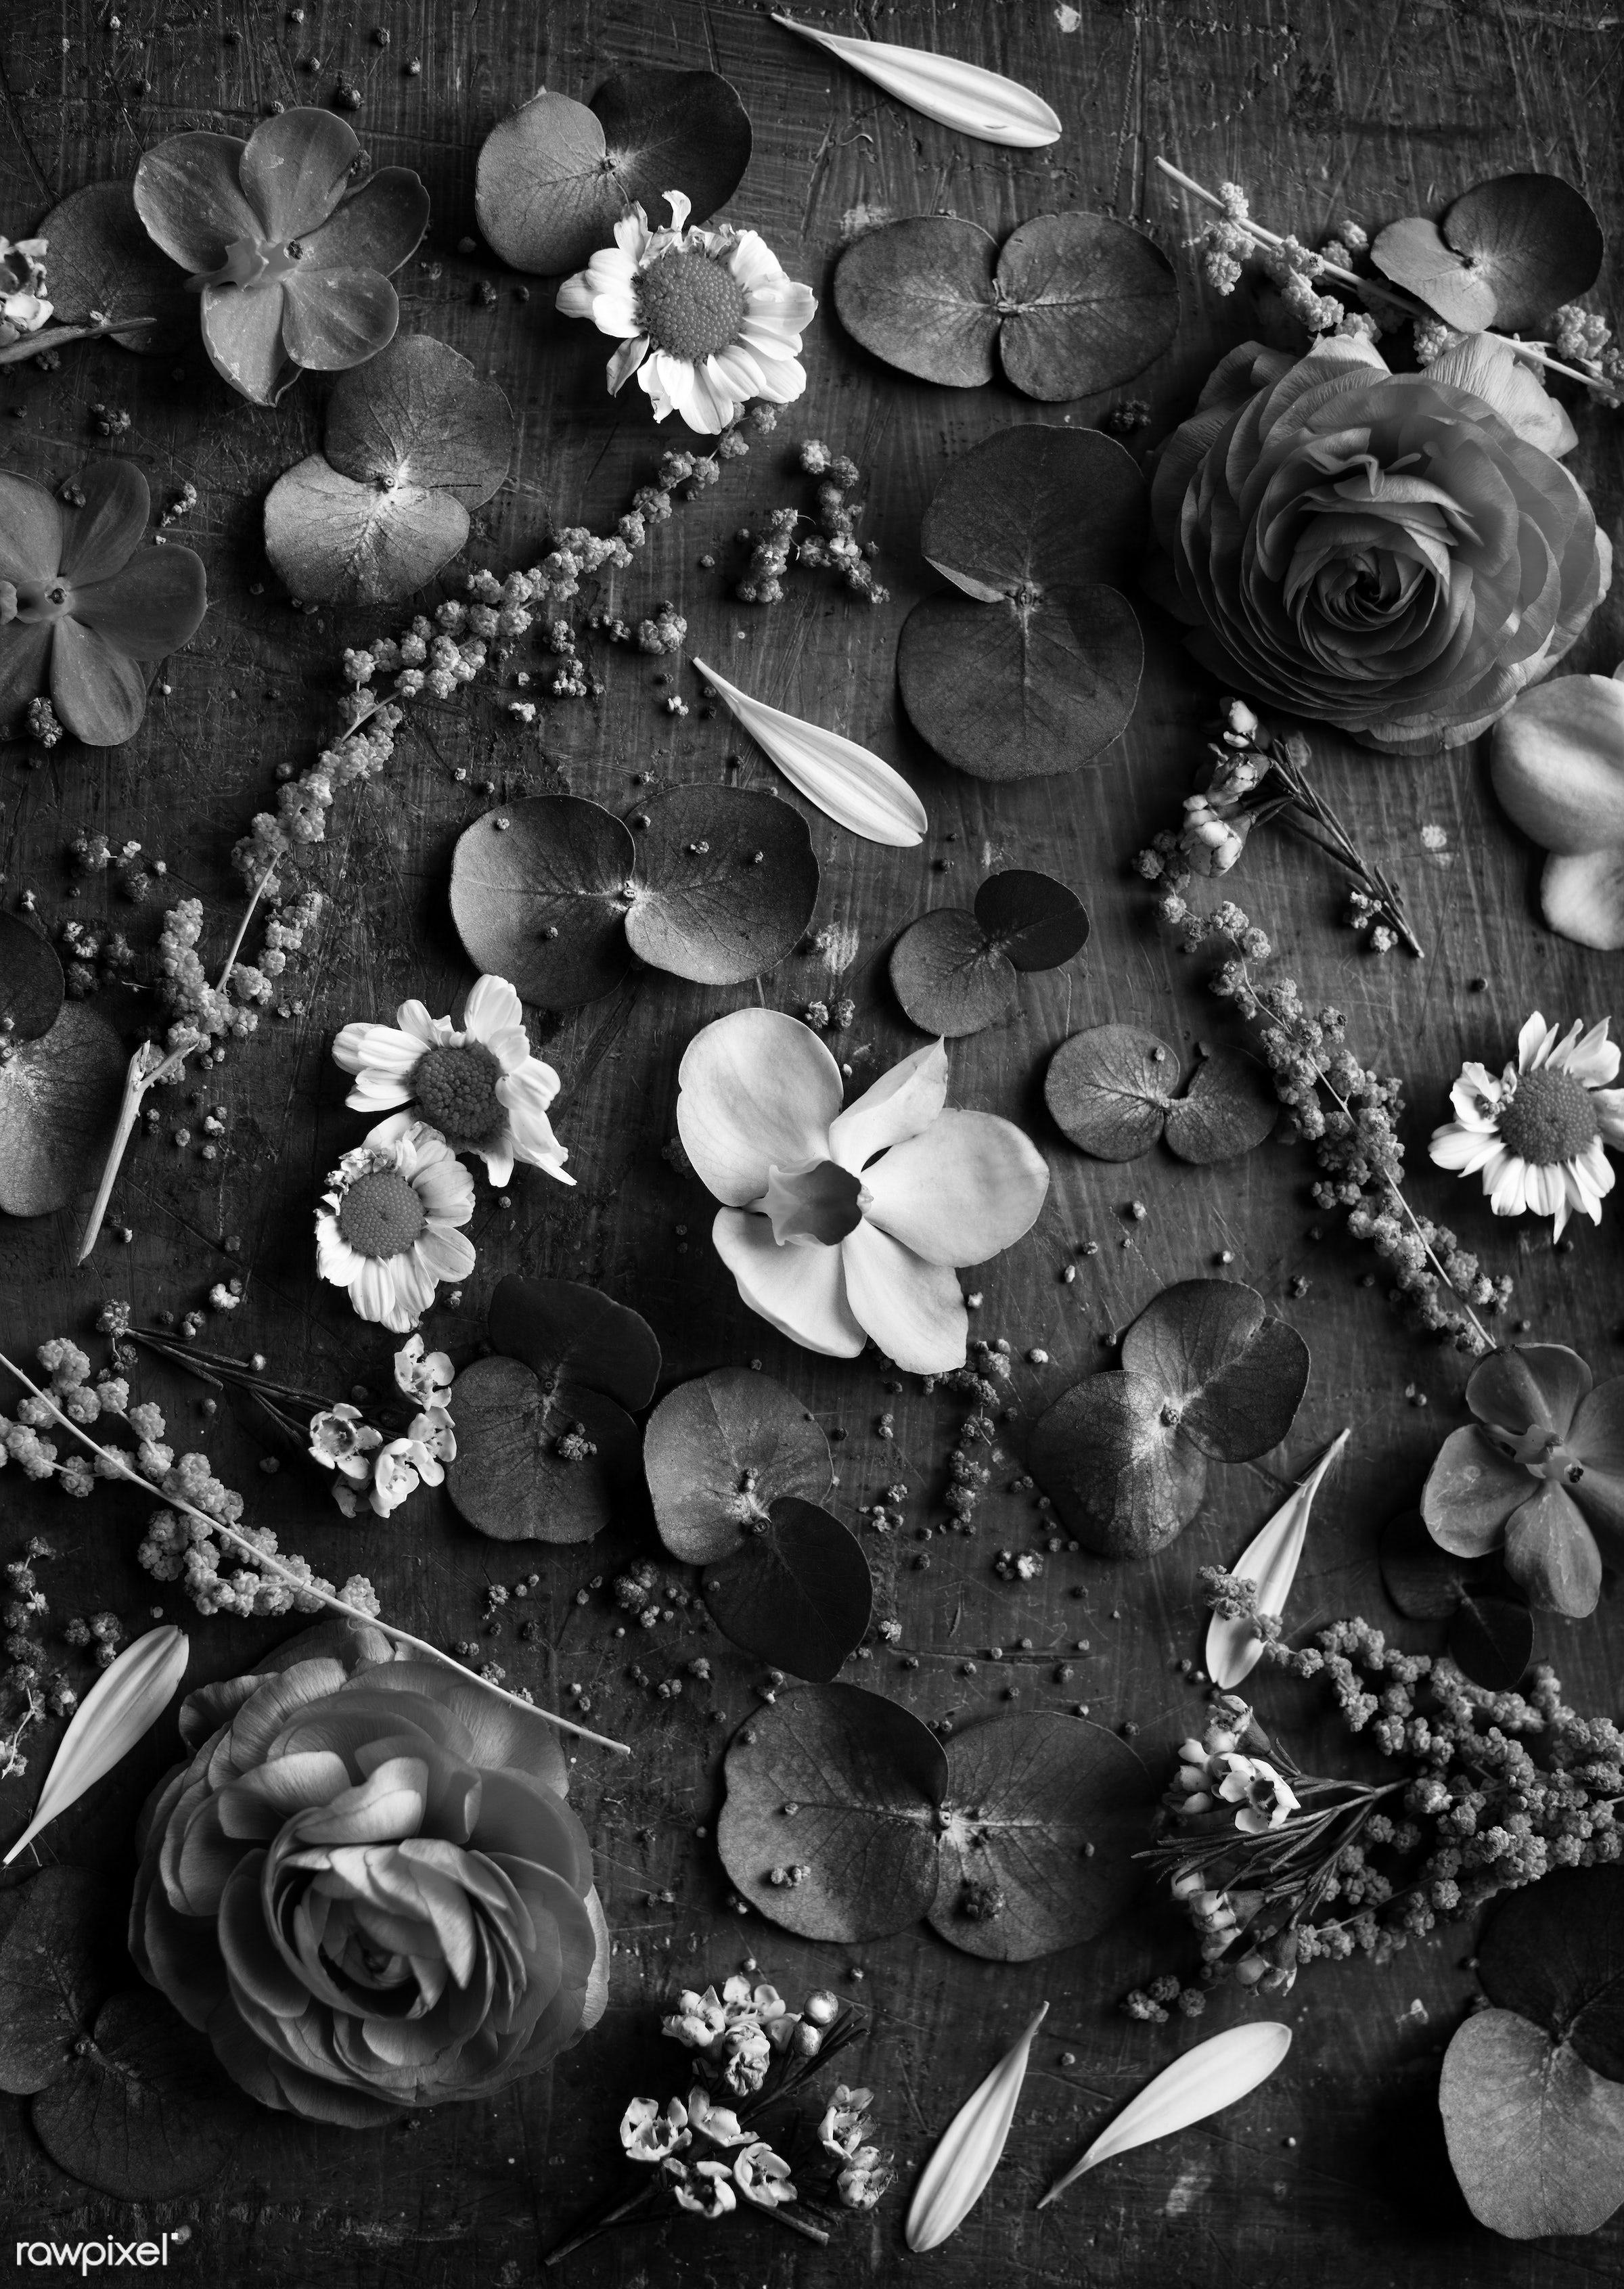 Rustic decorative flowers and leaves - plant, bouquet, concept, decorative, botany, leaf, botanical, leaves, romance, spring...